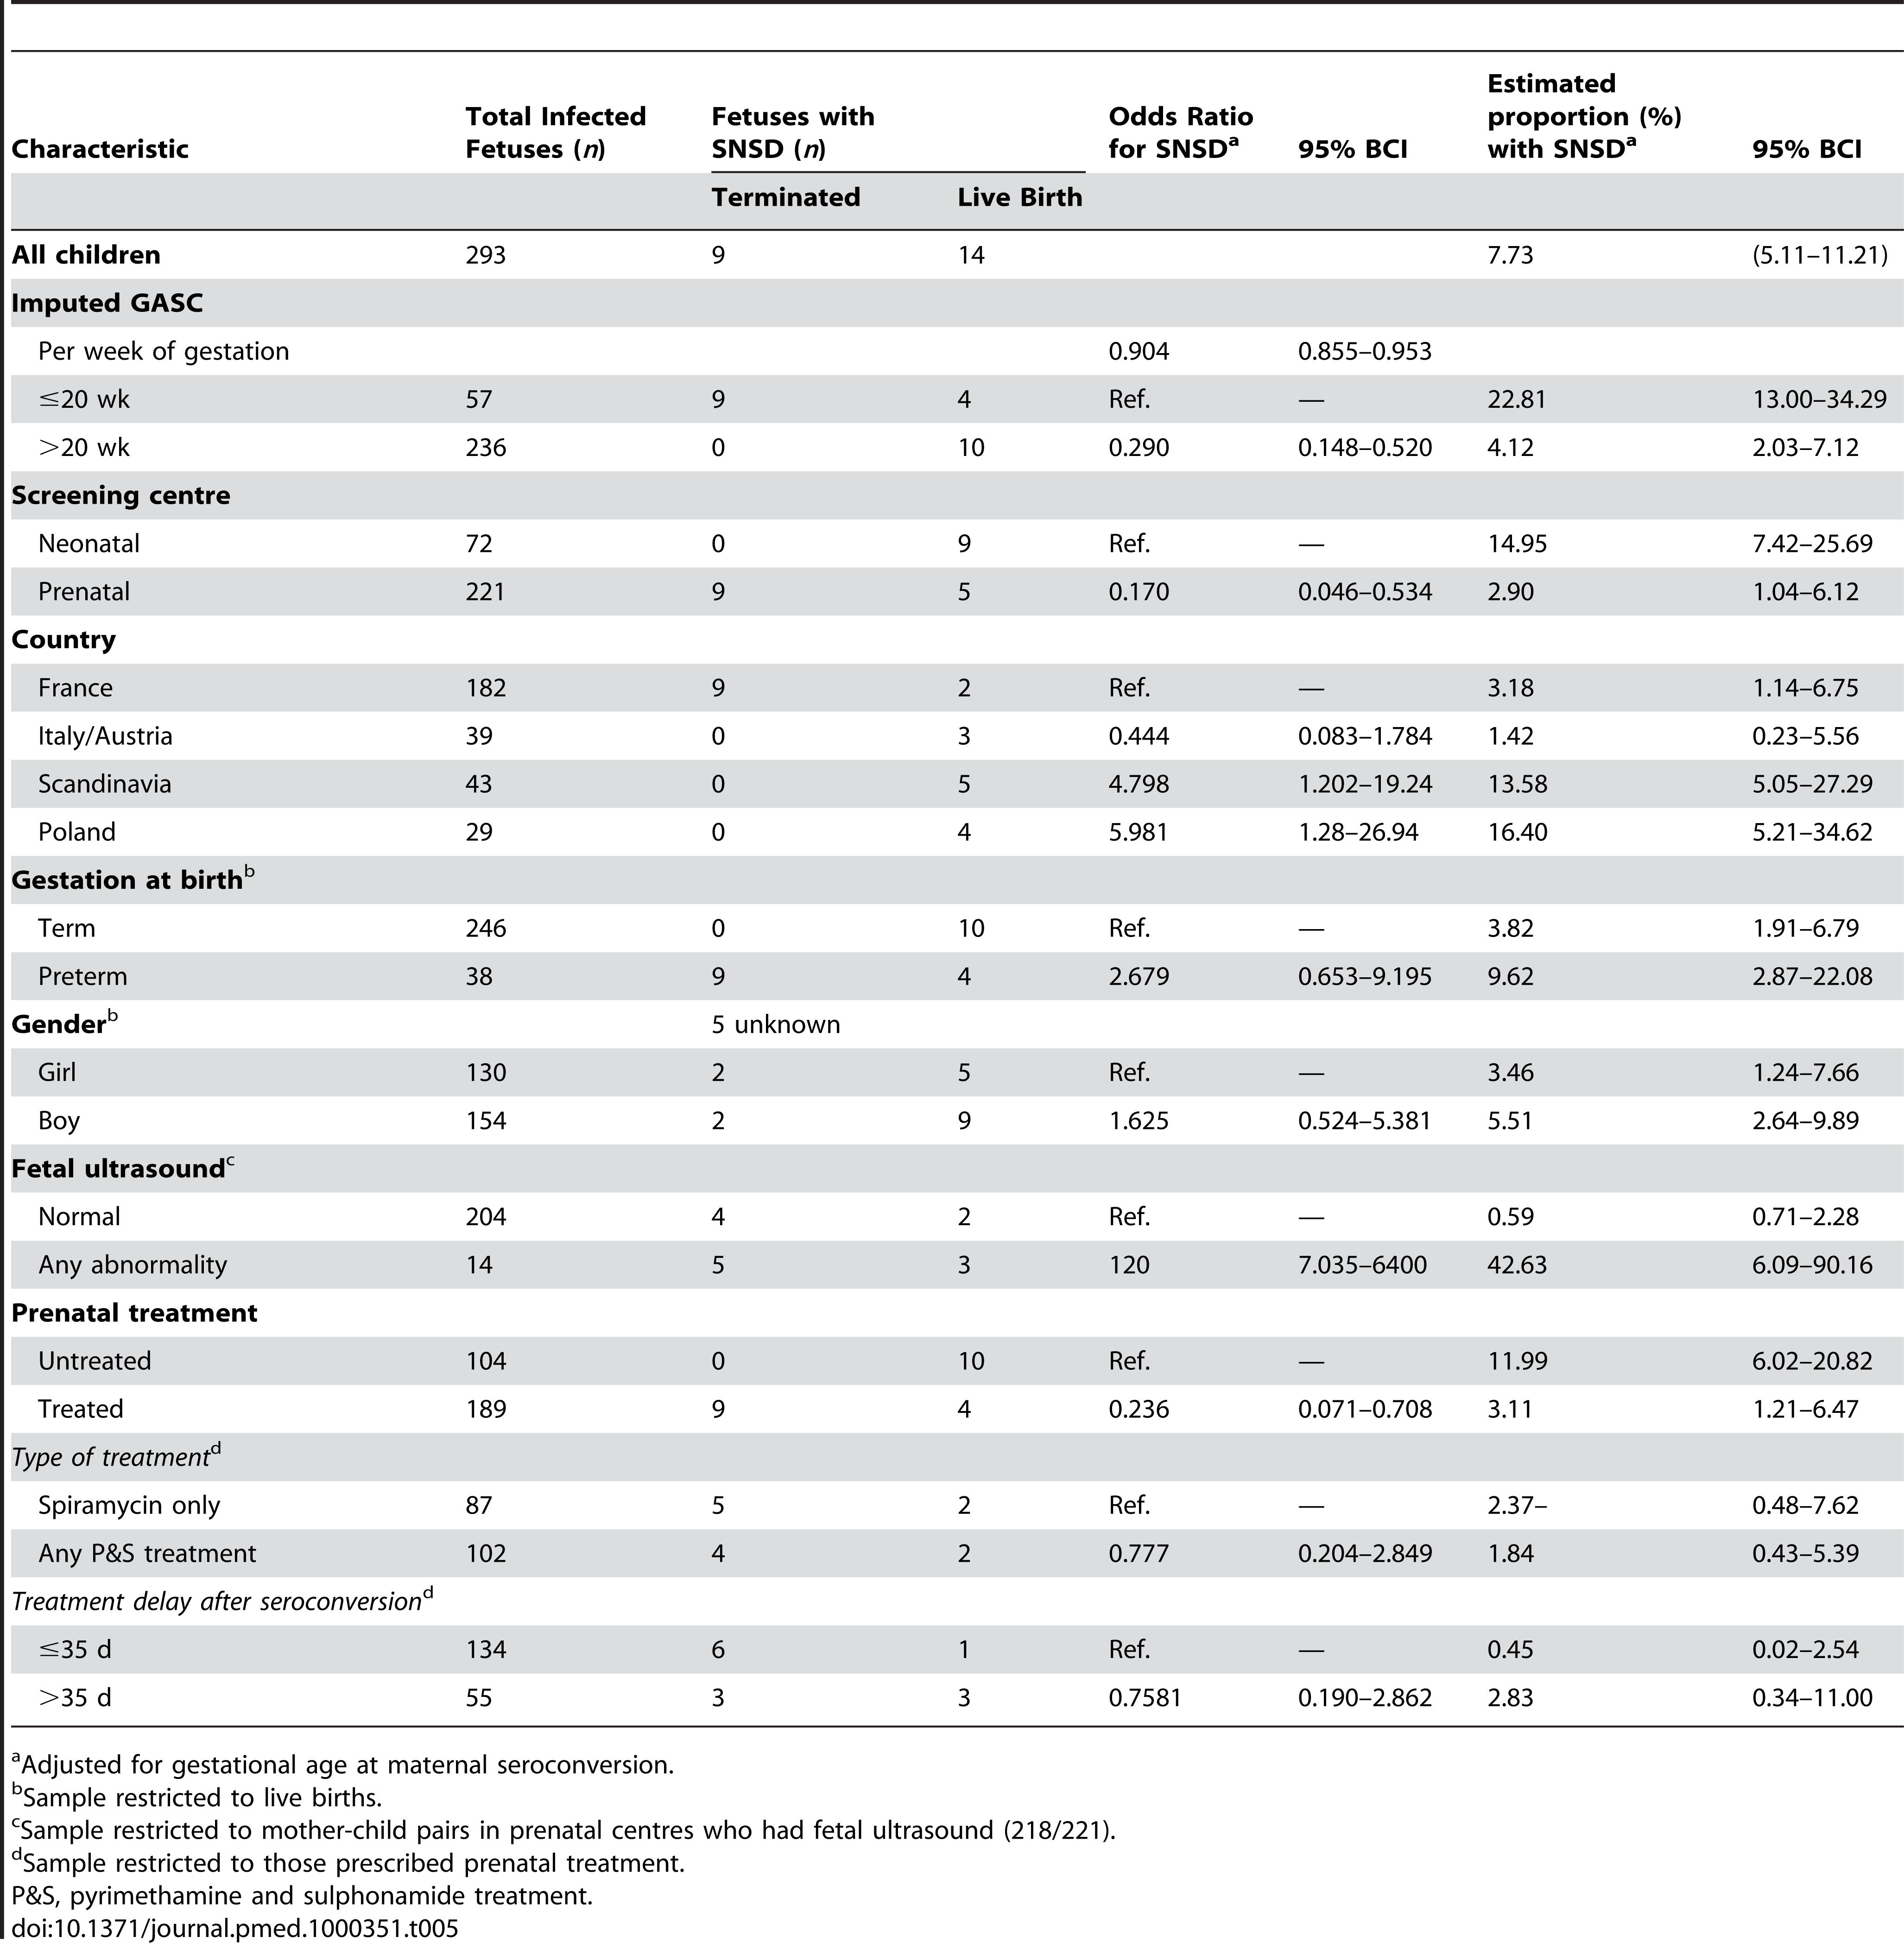 Prenatal characteristics associated with SNSD.